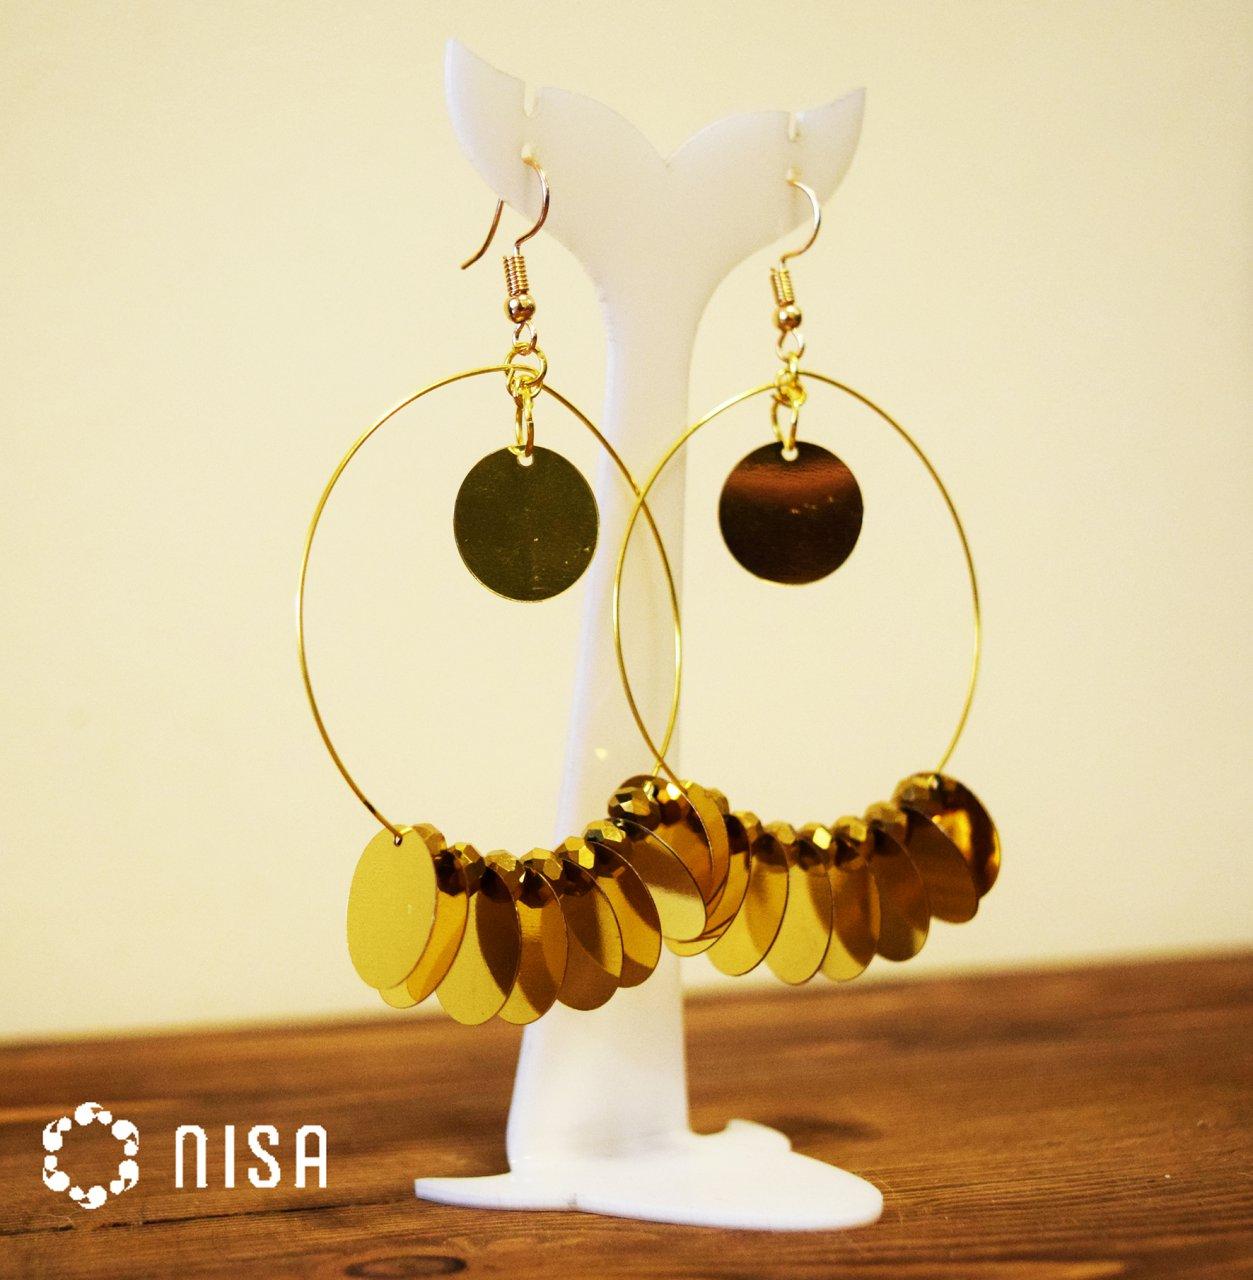 گوشواره حلقه ای طلایی